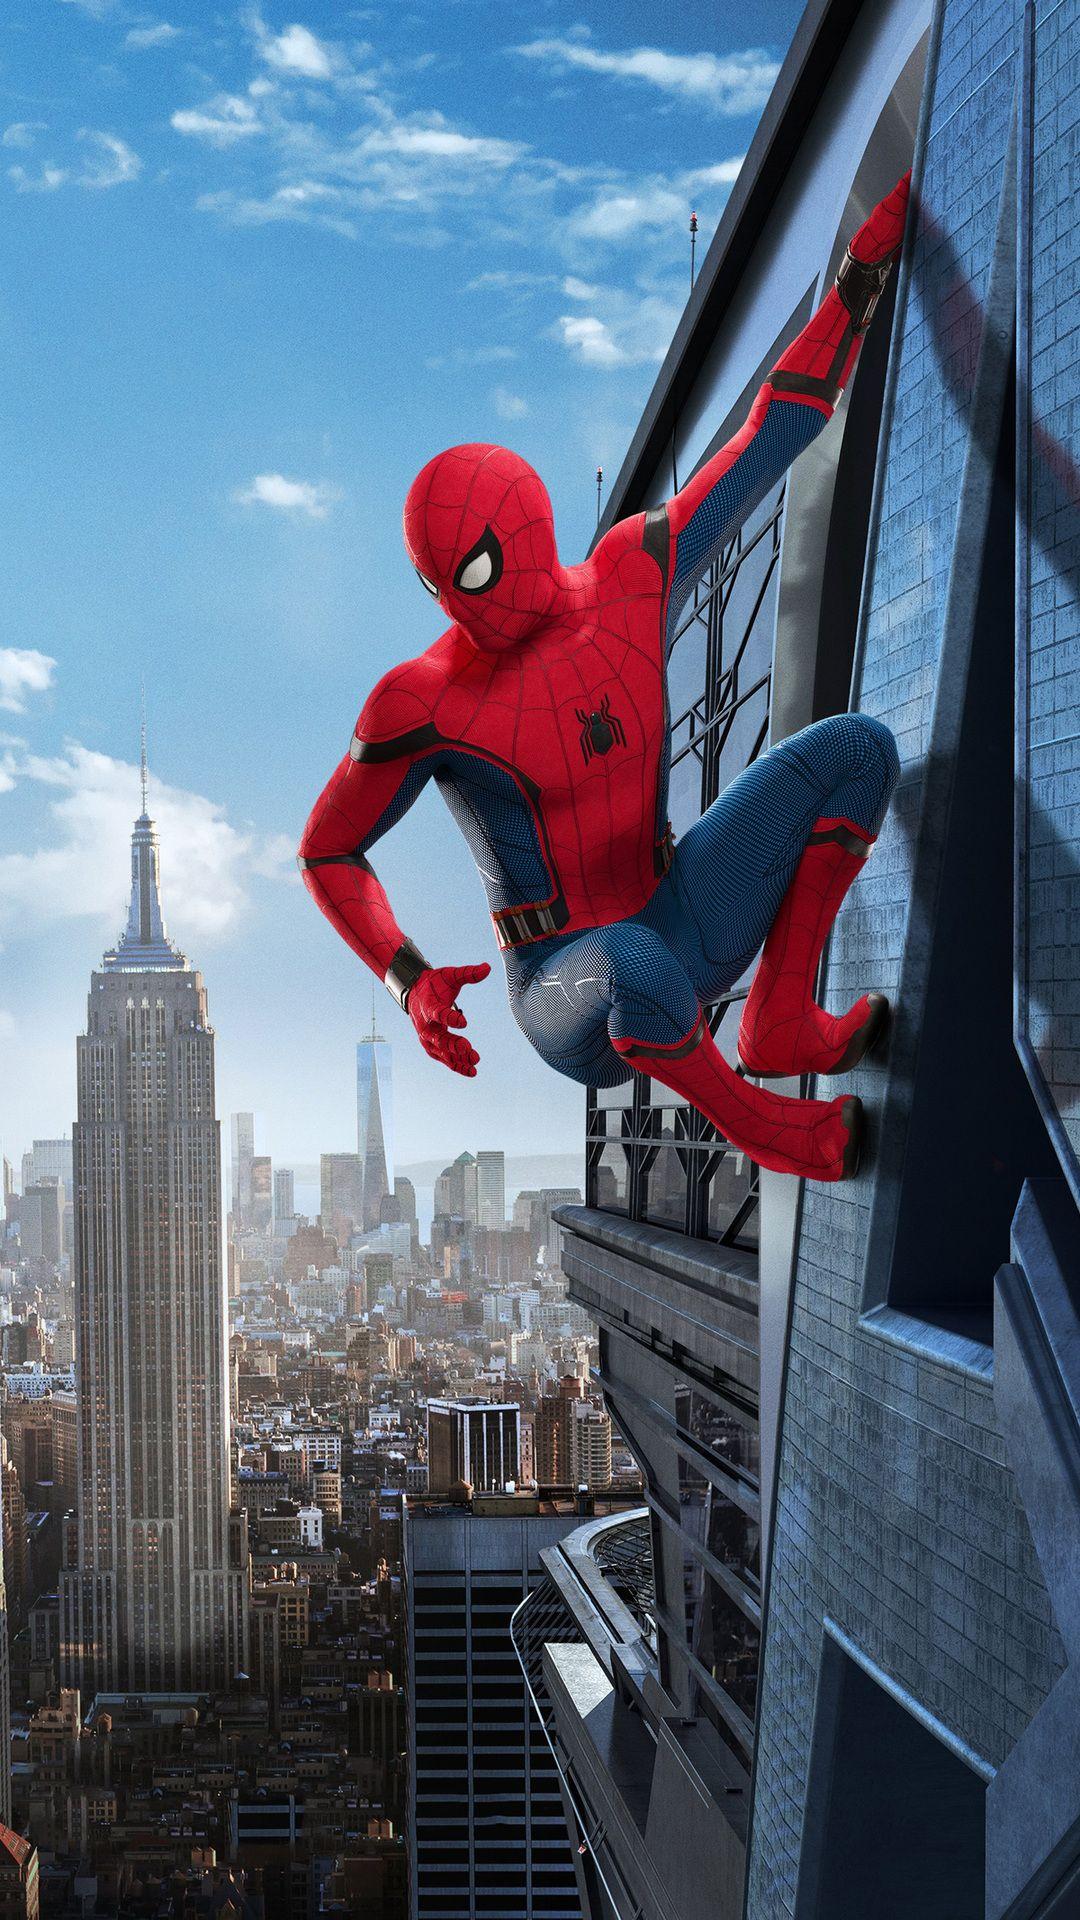 Spiderman Infinity War Download 4k Wallpapers For Iphone